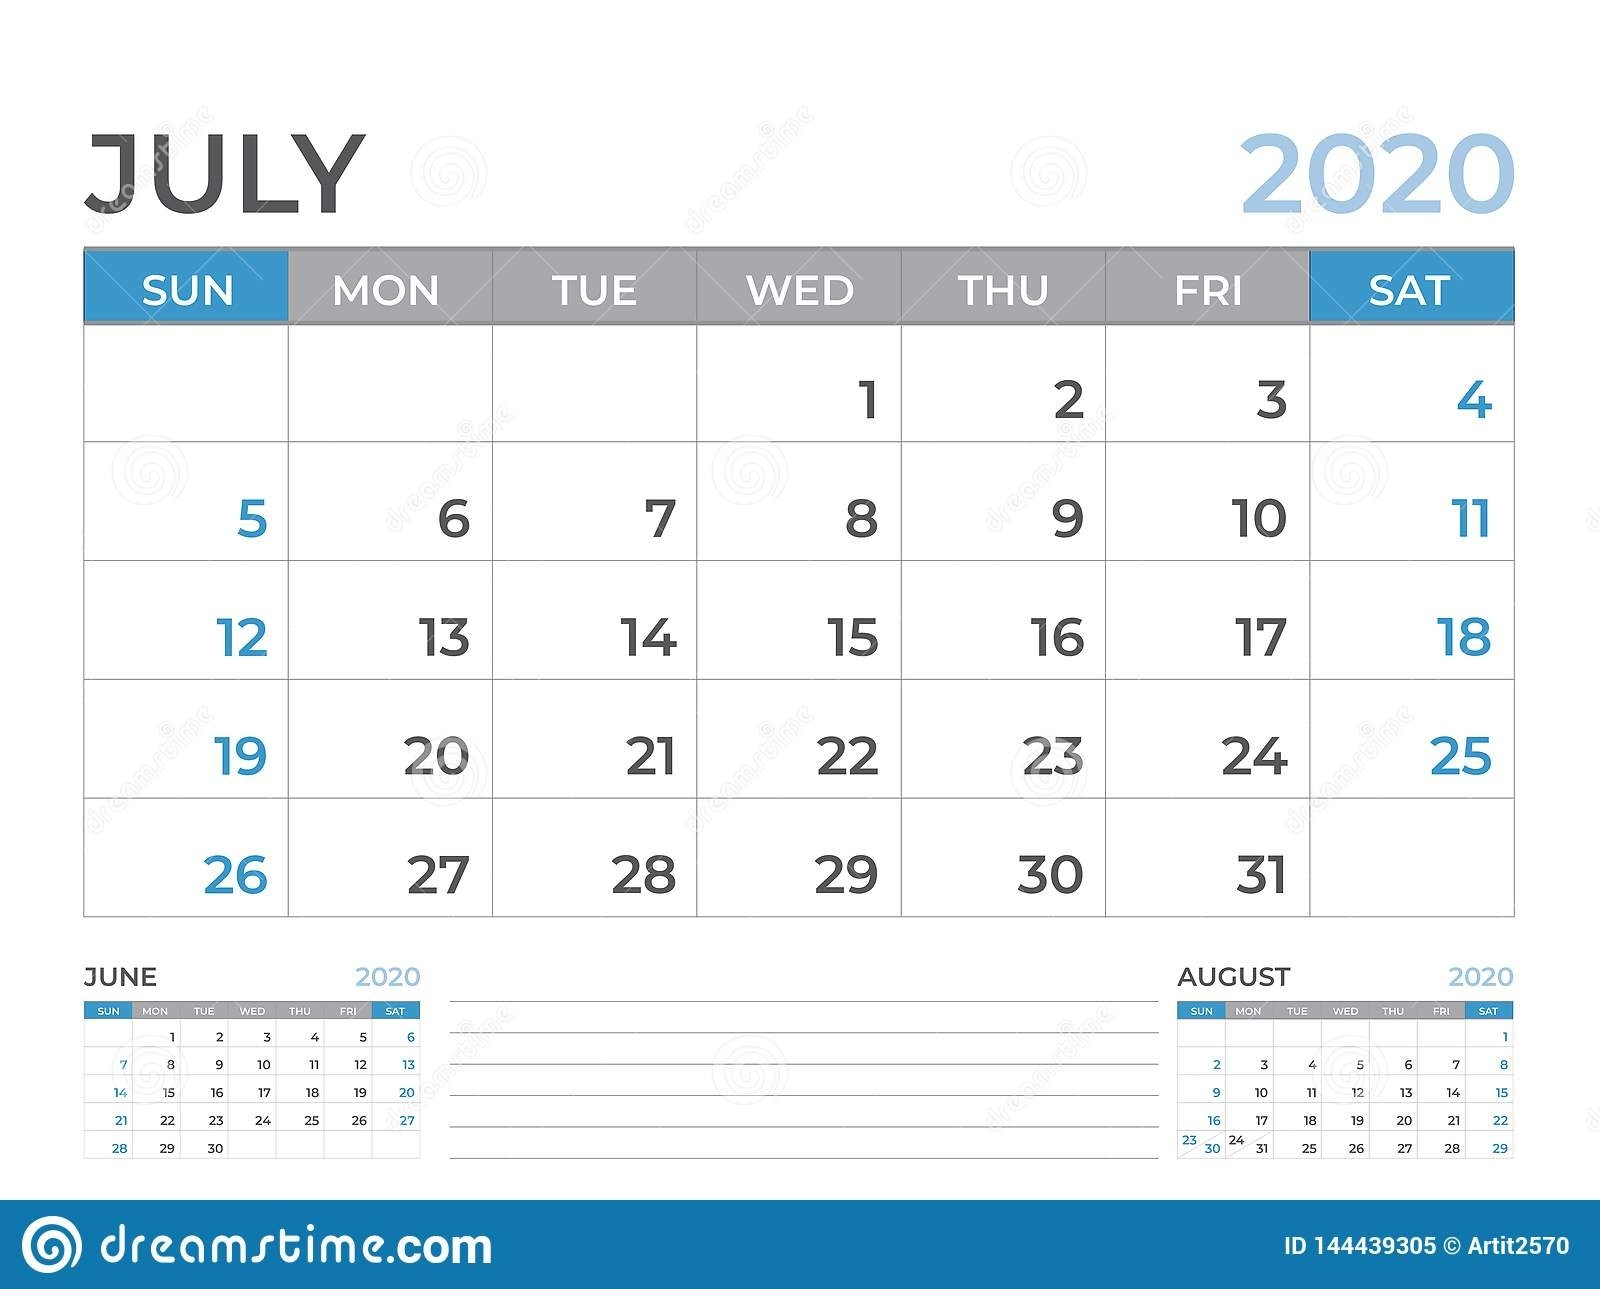 June 2020 Calendar Template, Desk Calendar Layout Size 8 X 6-Monday To Friday Planner Templates 2020